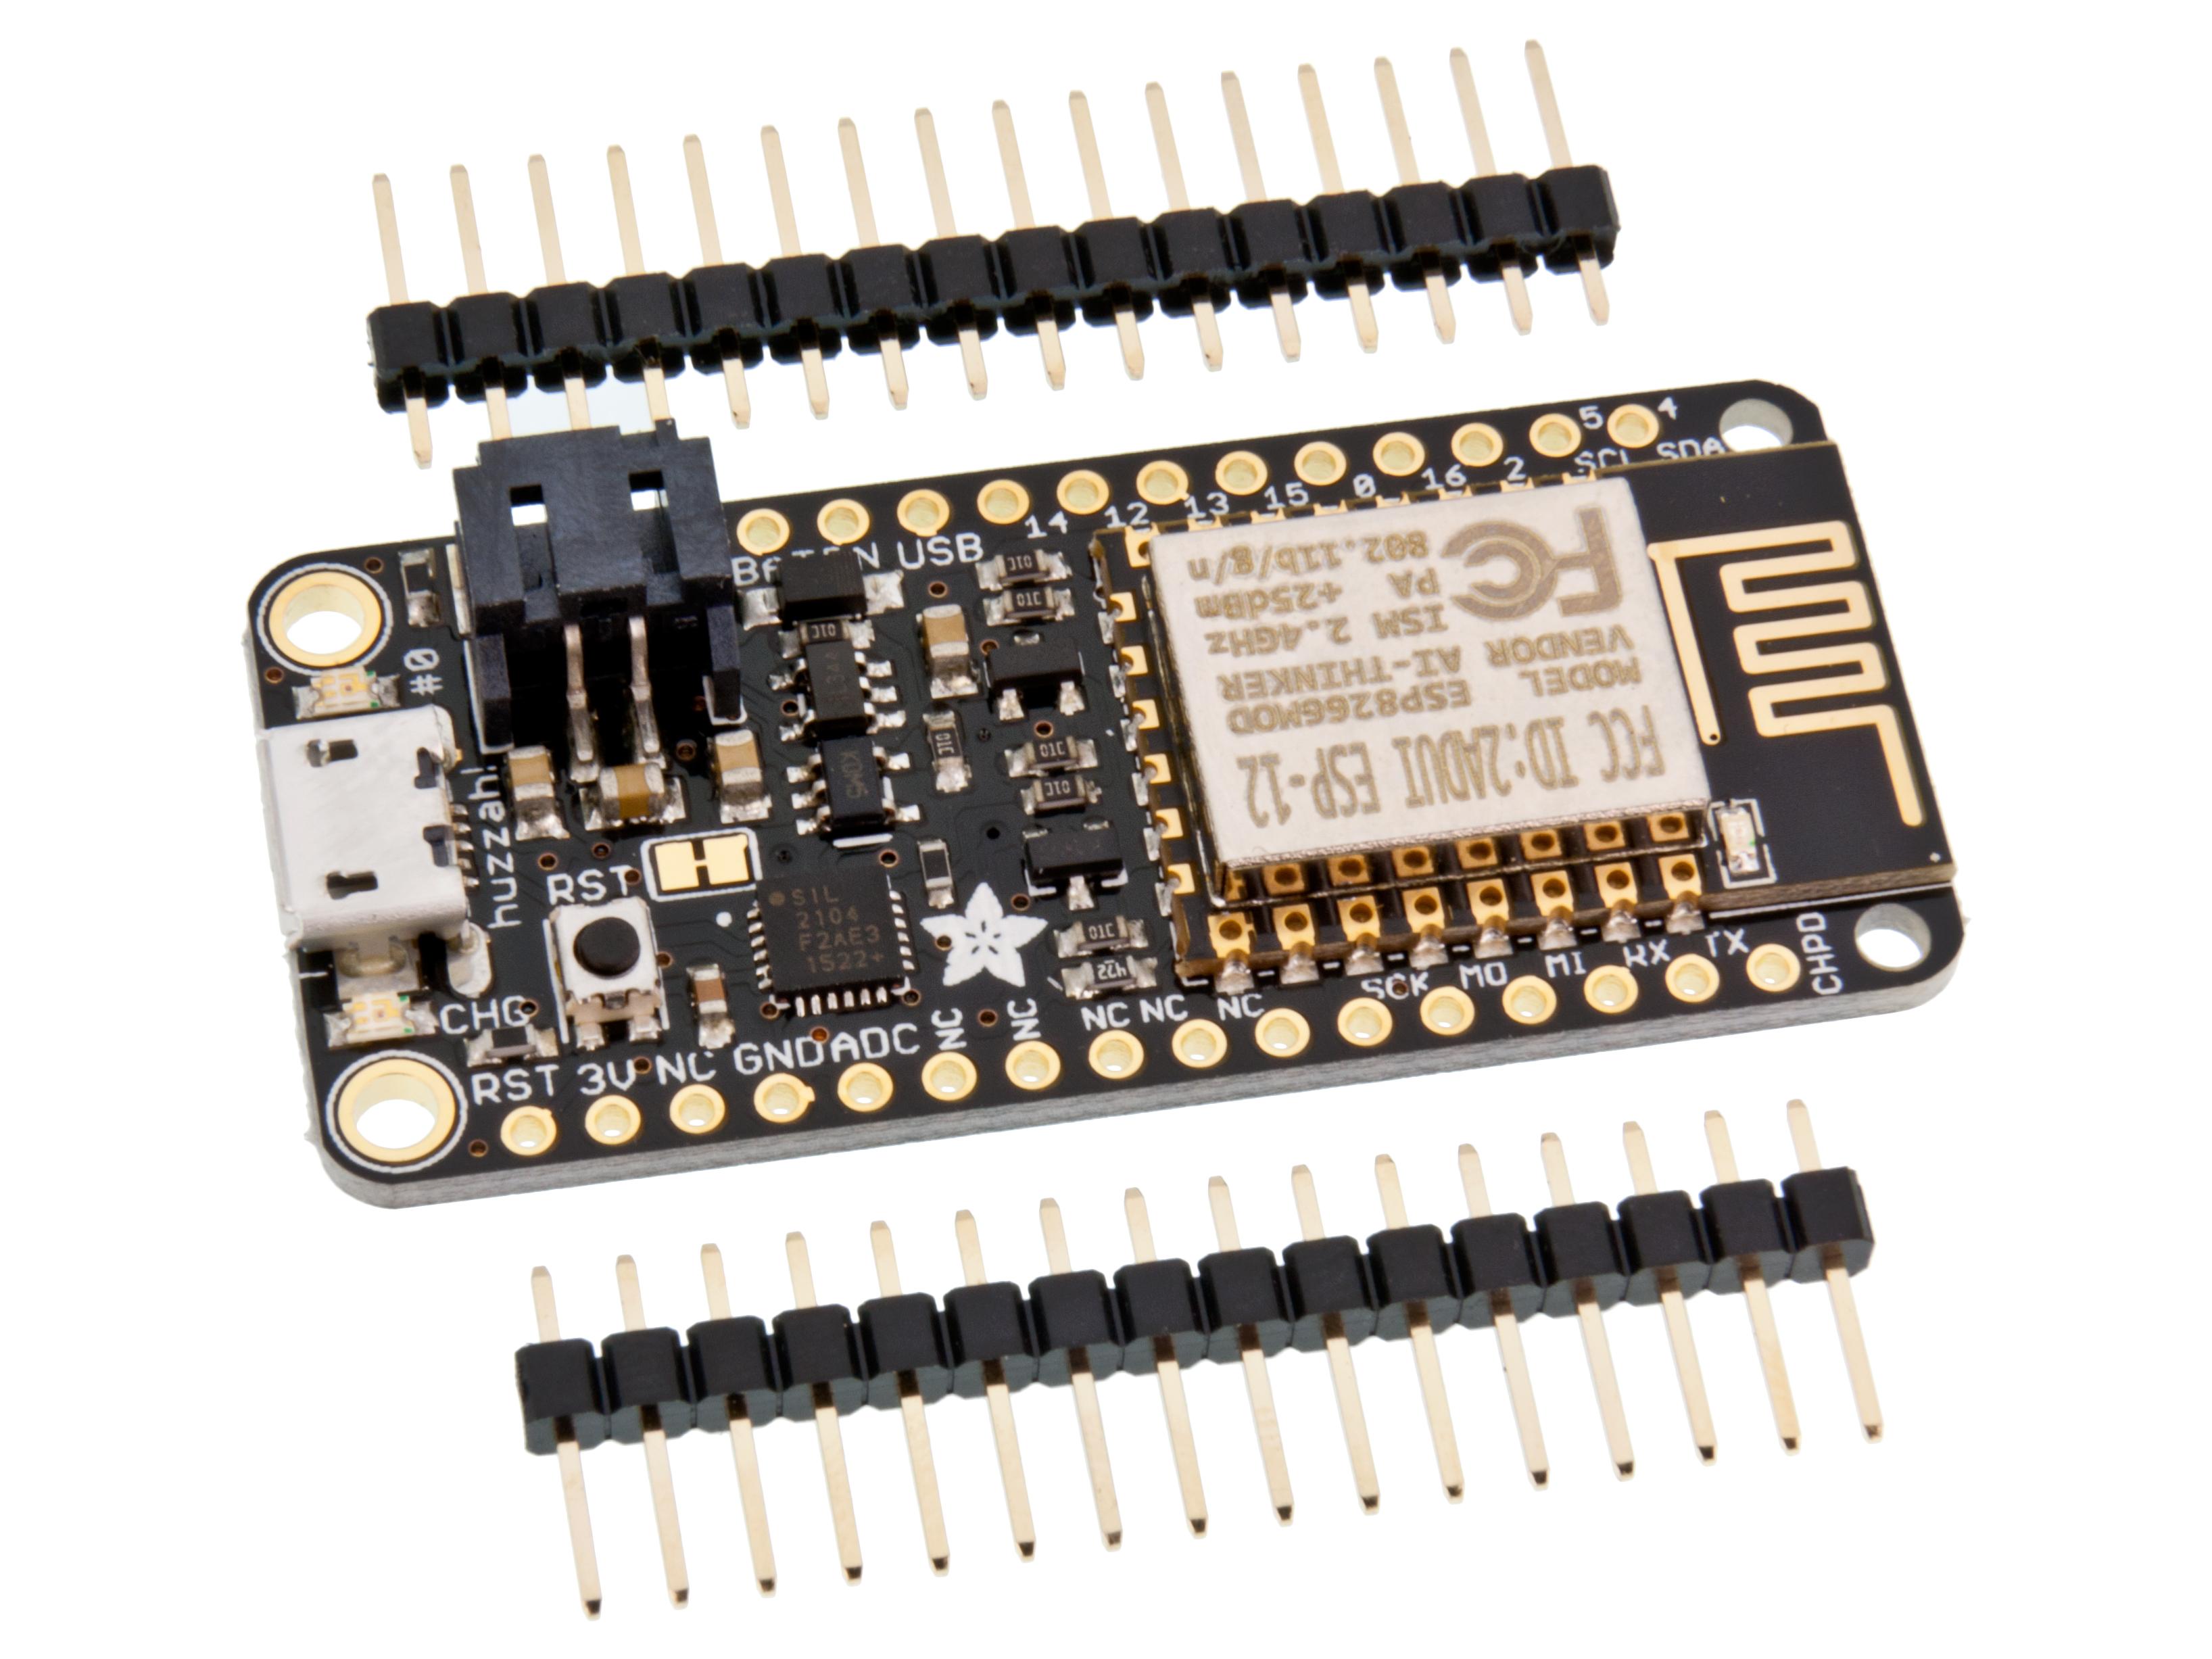 Adafruit Feather Huzzah Esp8266 Ceo News Circuithelp Arduino Micro Home Embedded